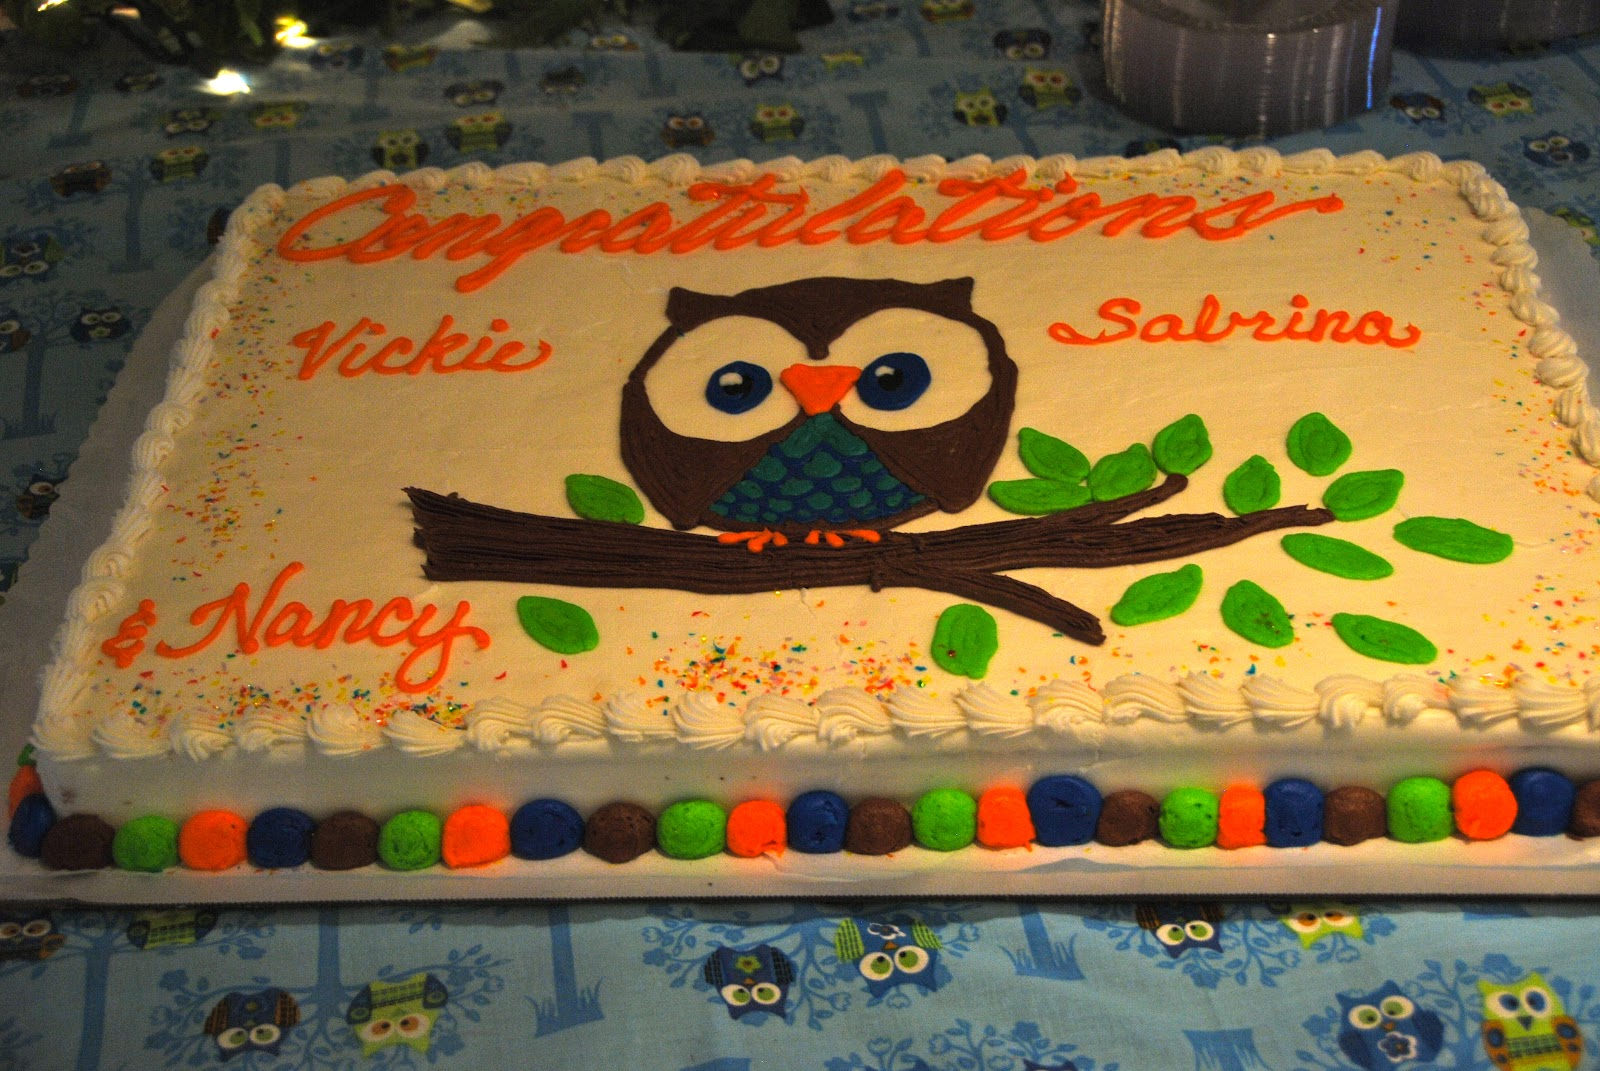 Walmart Cake Decorating Fail